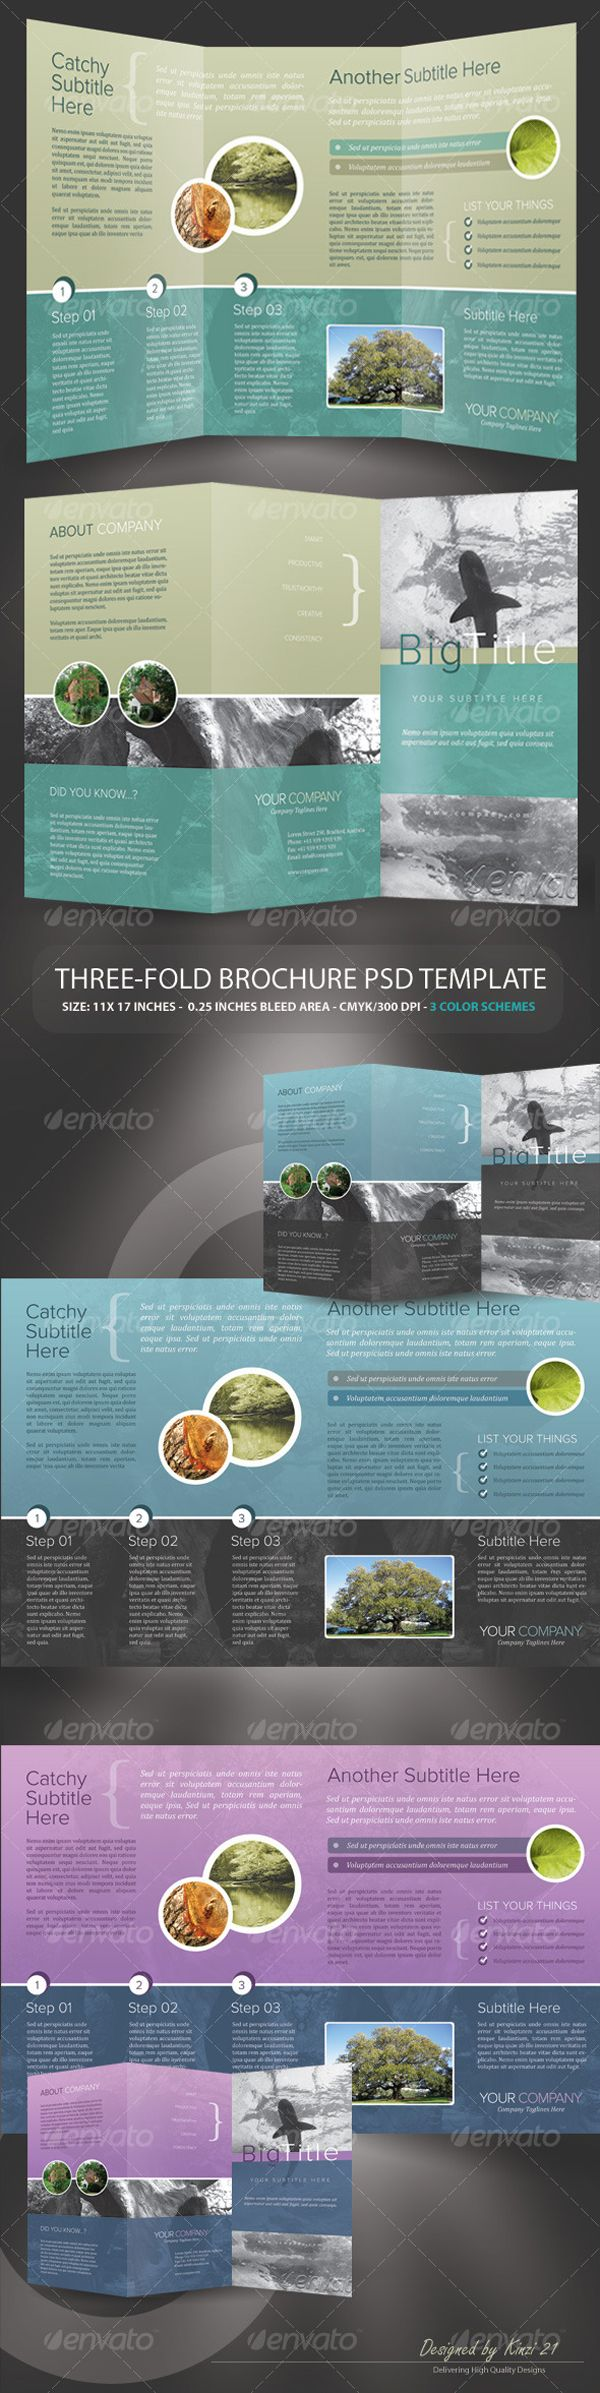 Tri-fold Brochure PSD Template by kinzi21